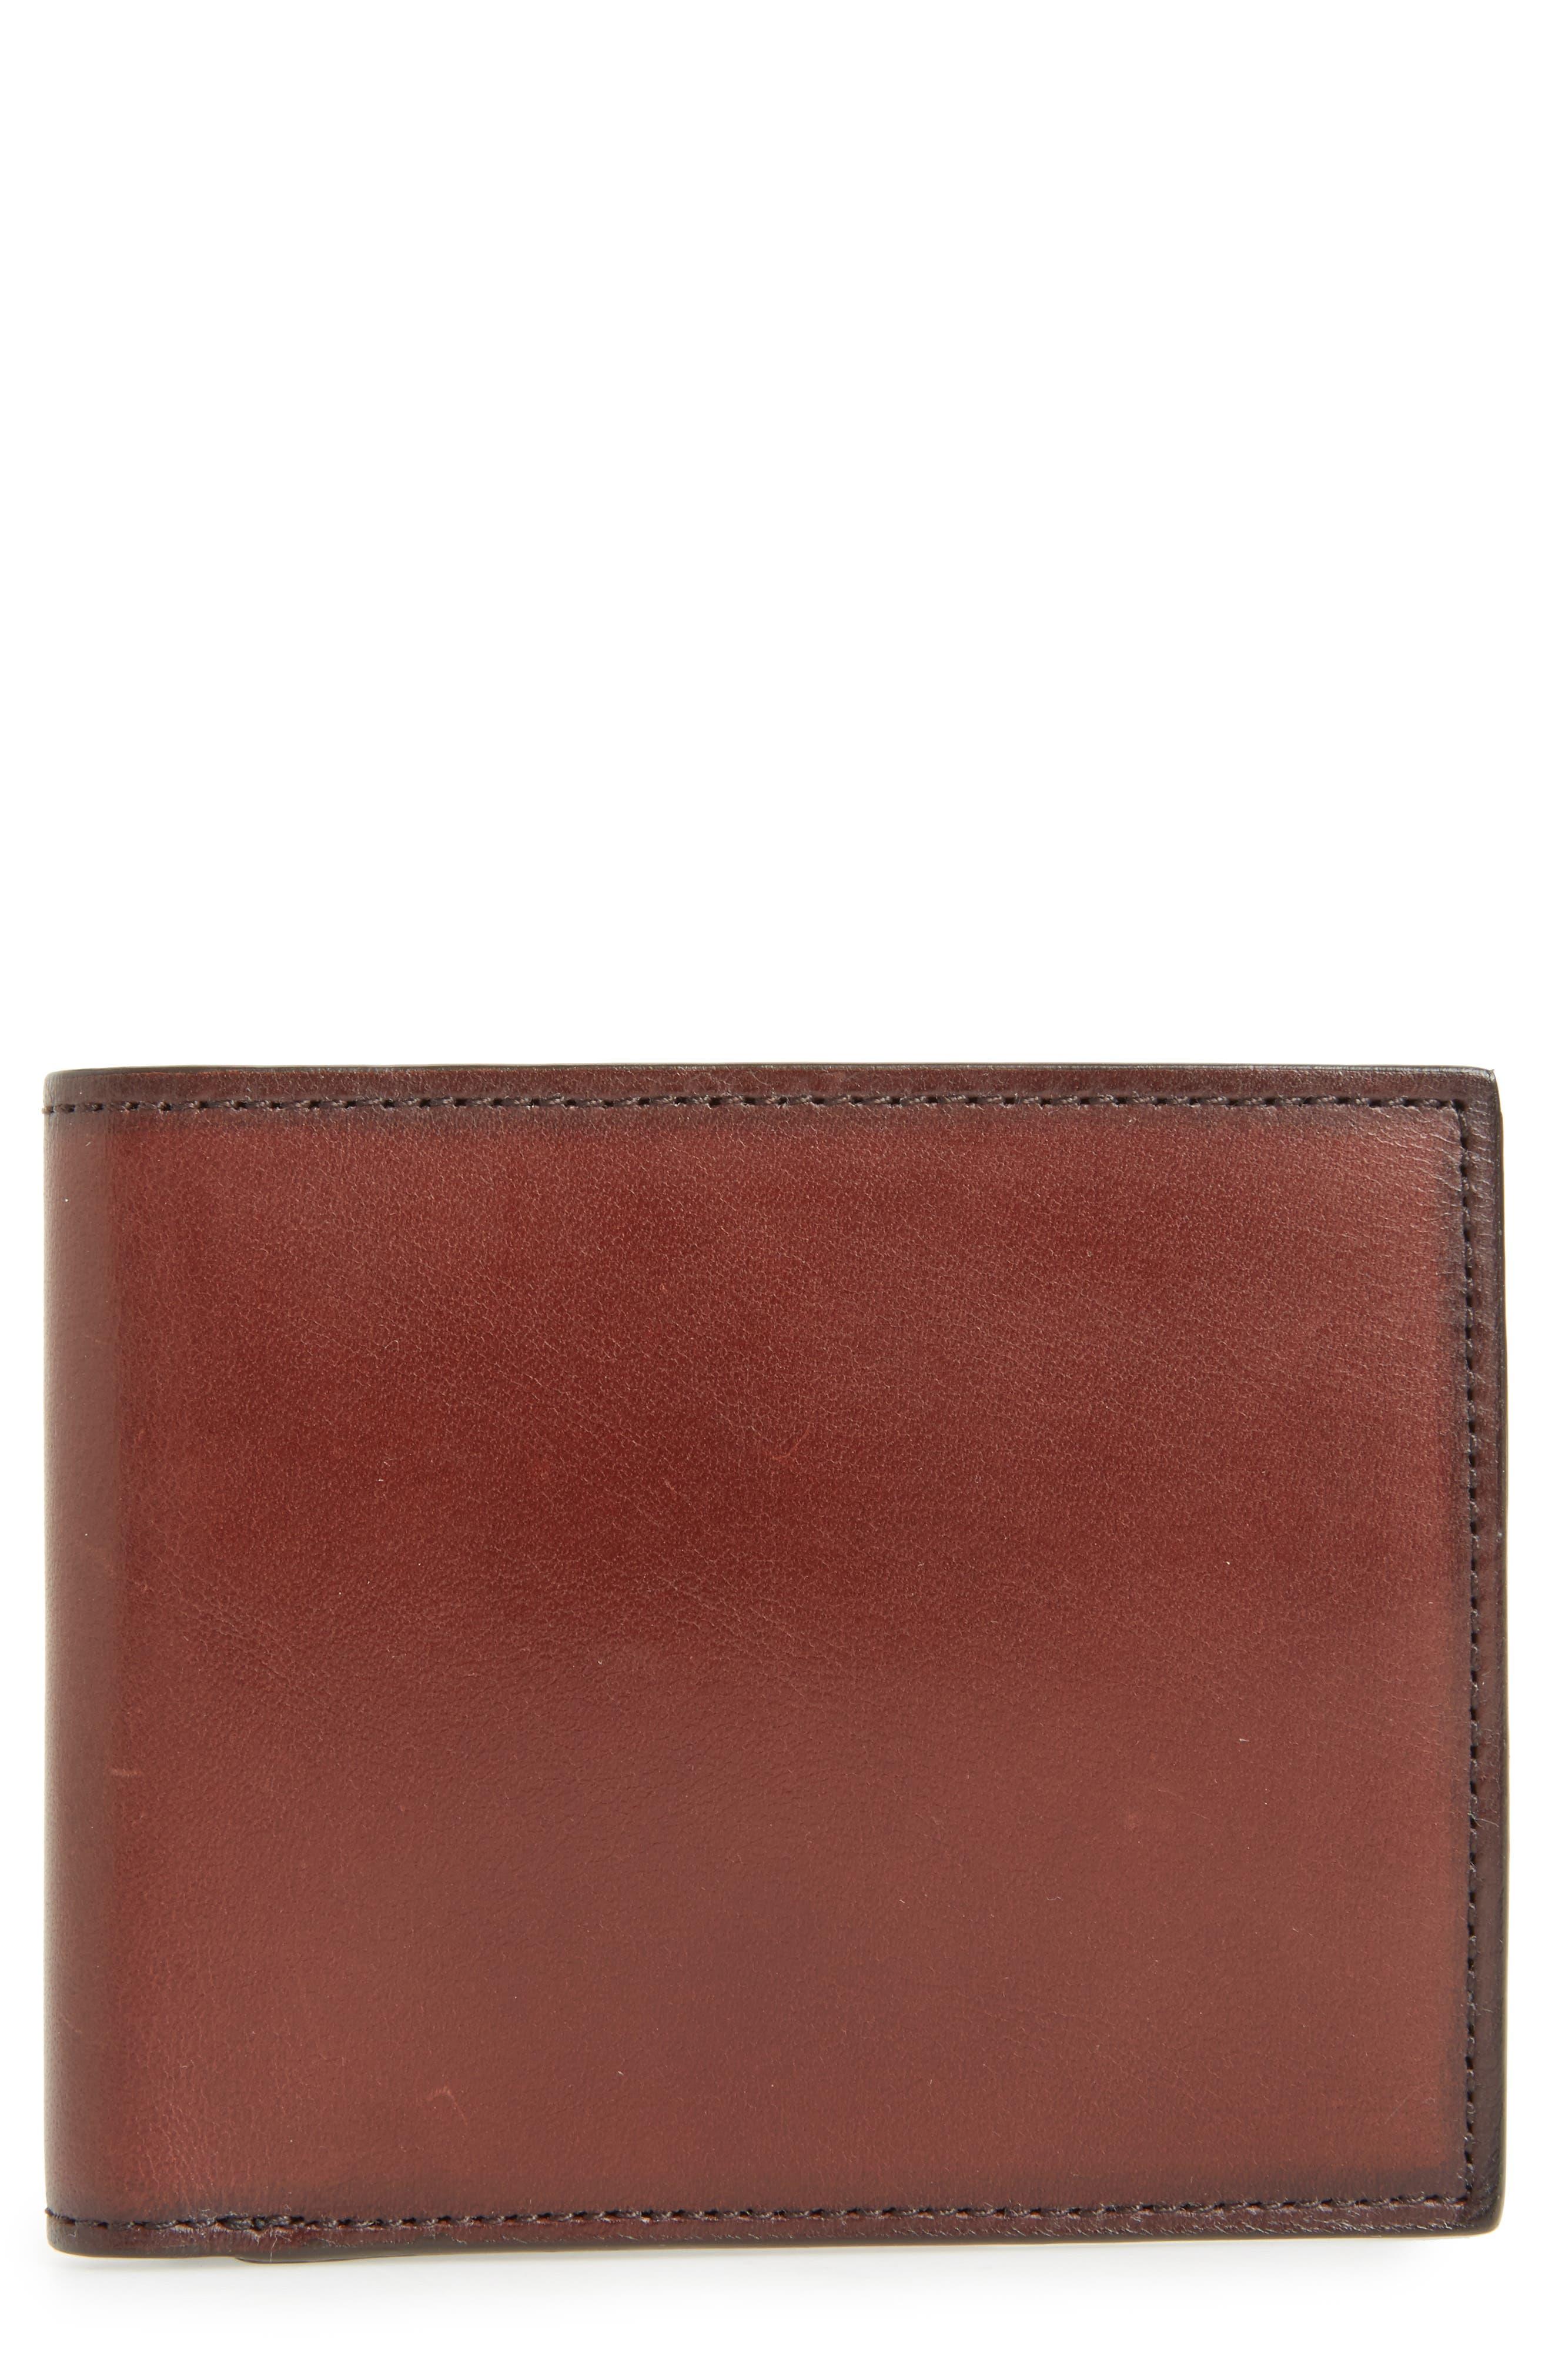 Parker Leather Wallet,                         Main,                         color, Brown